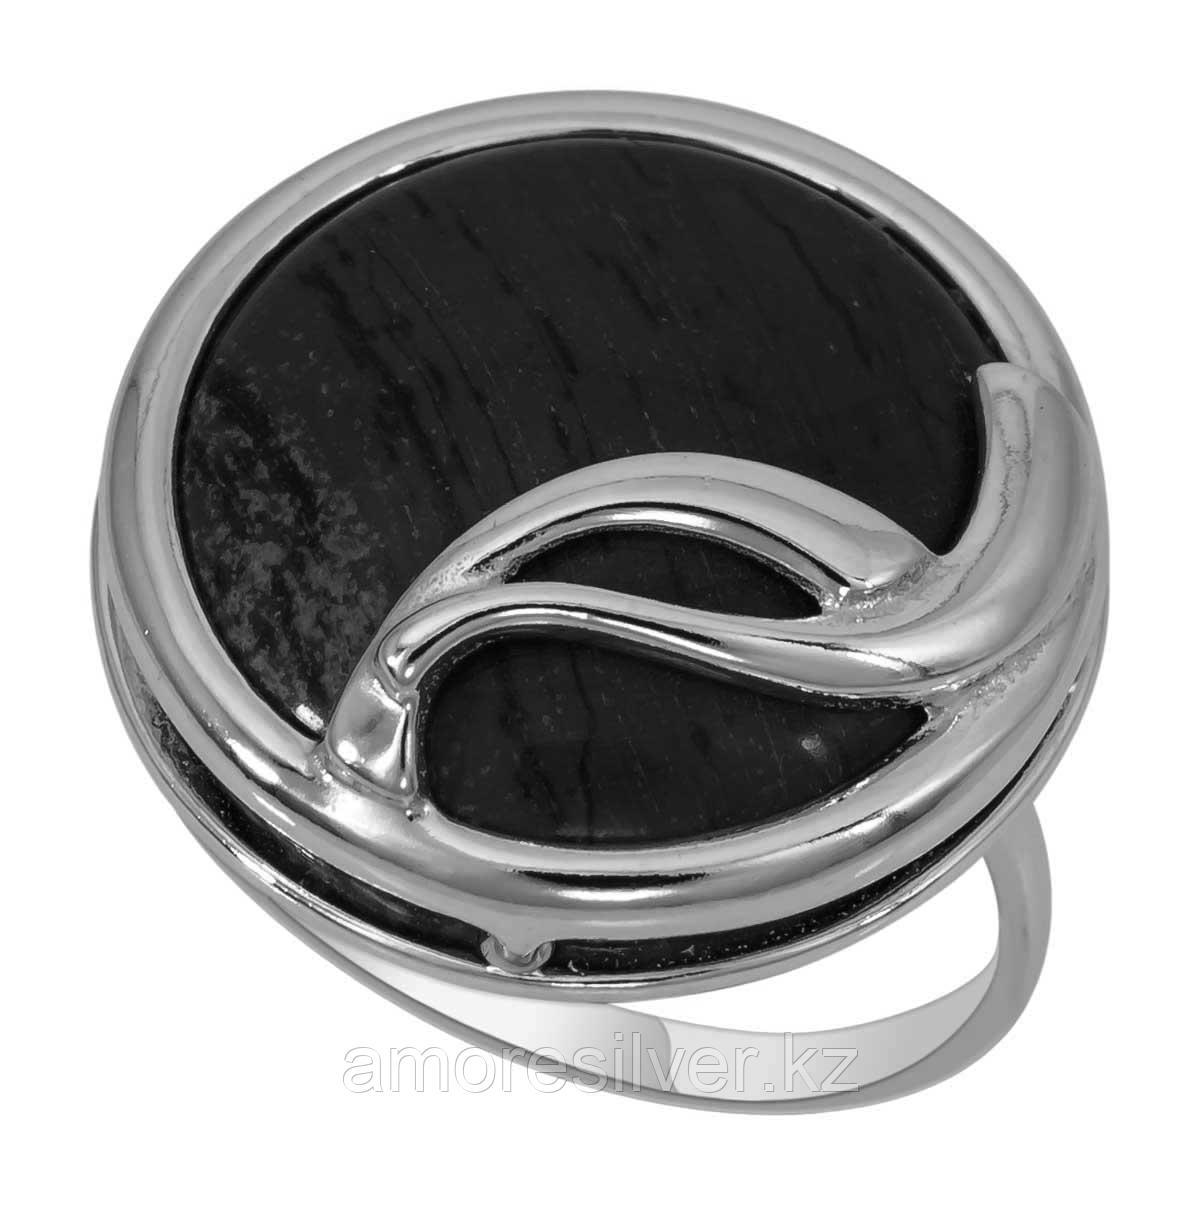 Кольцо Teosa серебро с родием, бирюза, , круг 13450Р